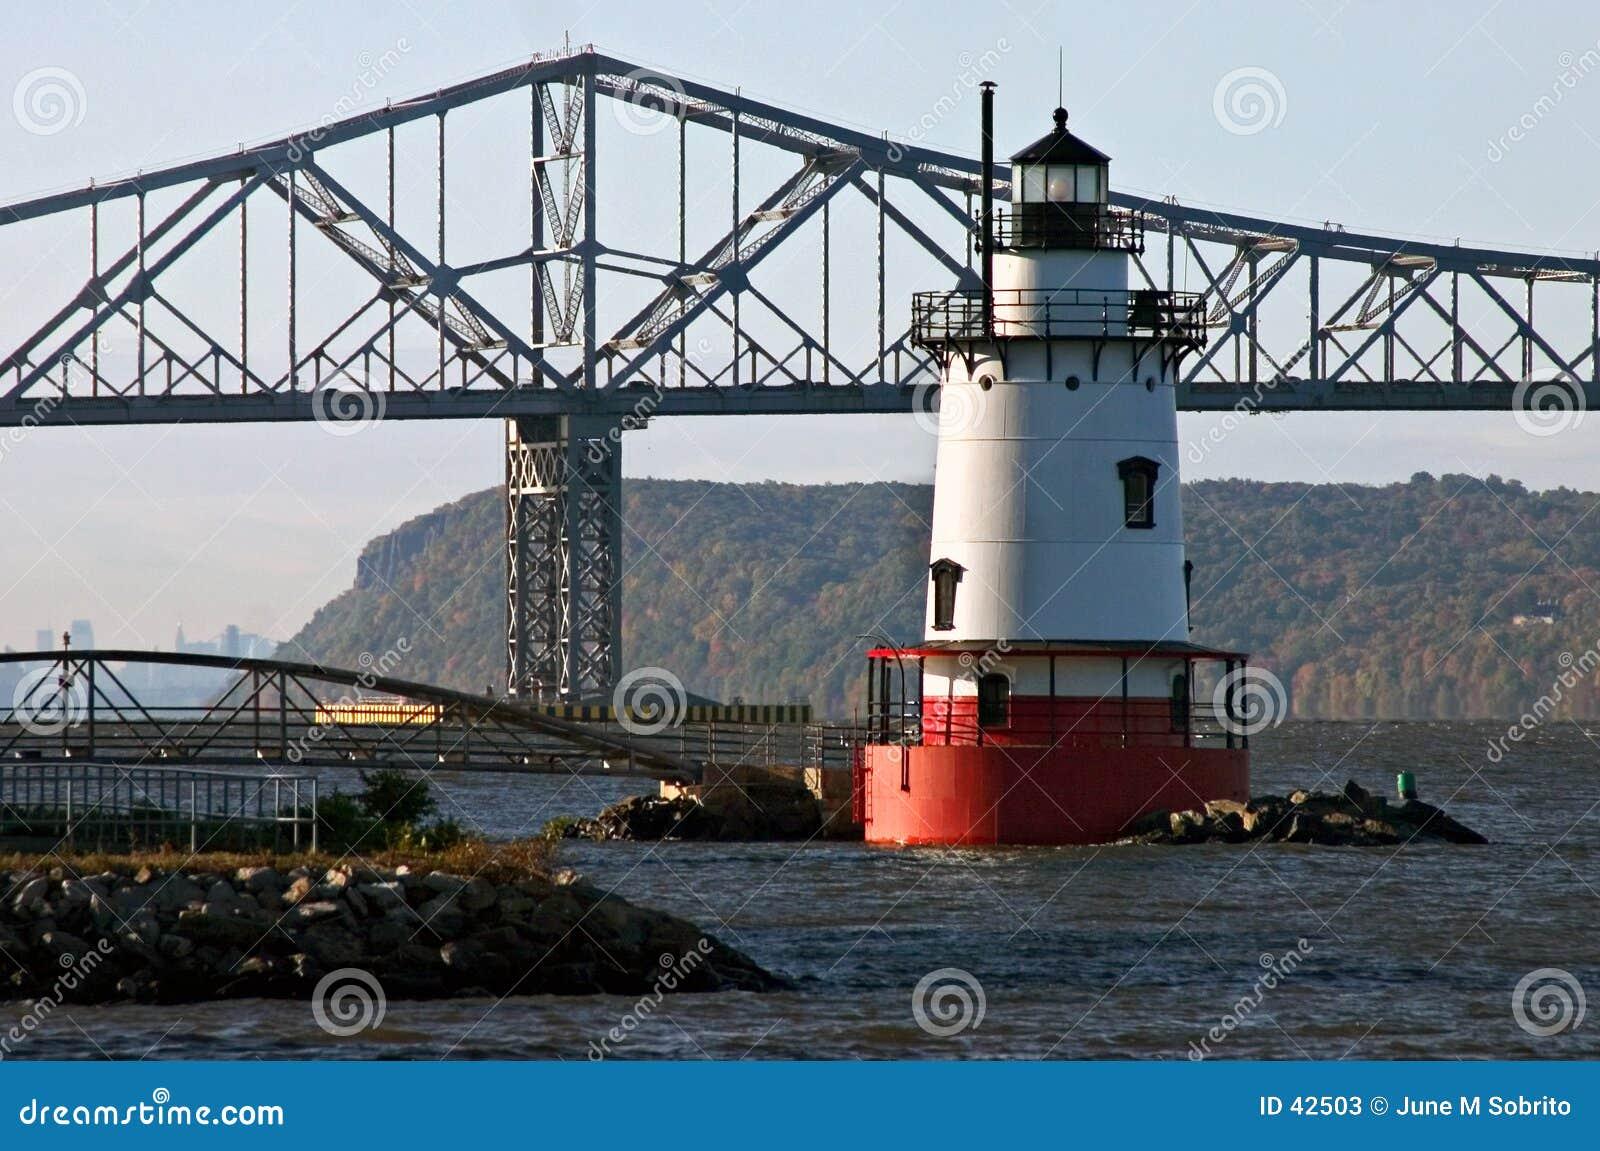 Lighthouse and Bridge